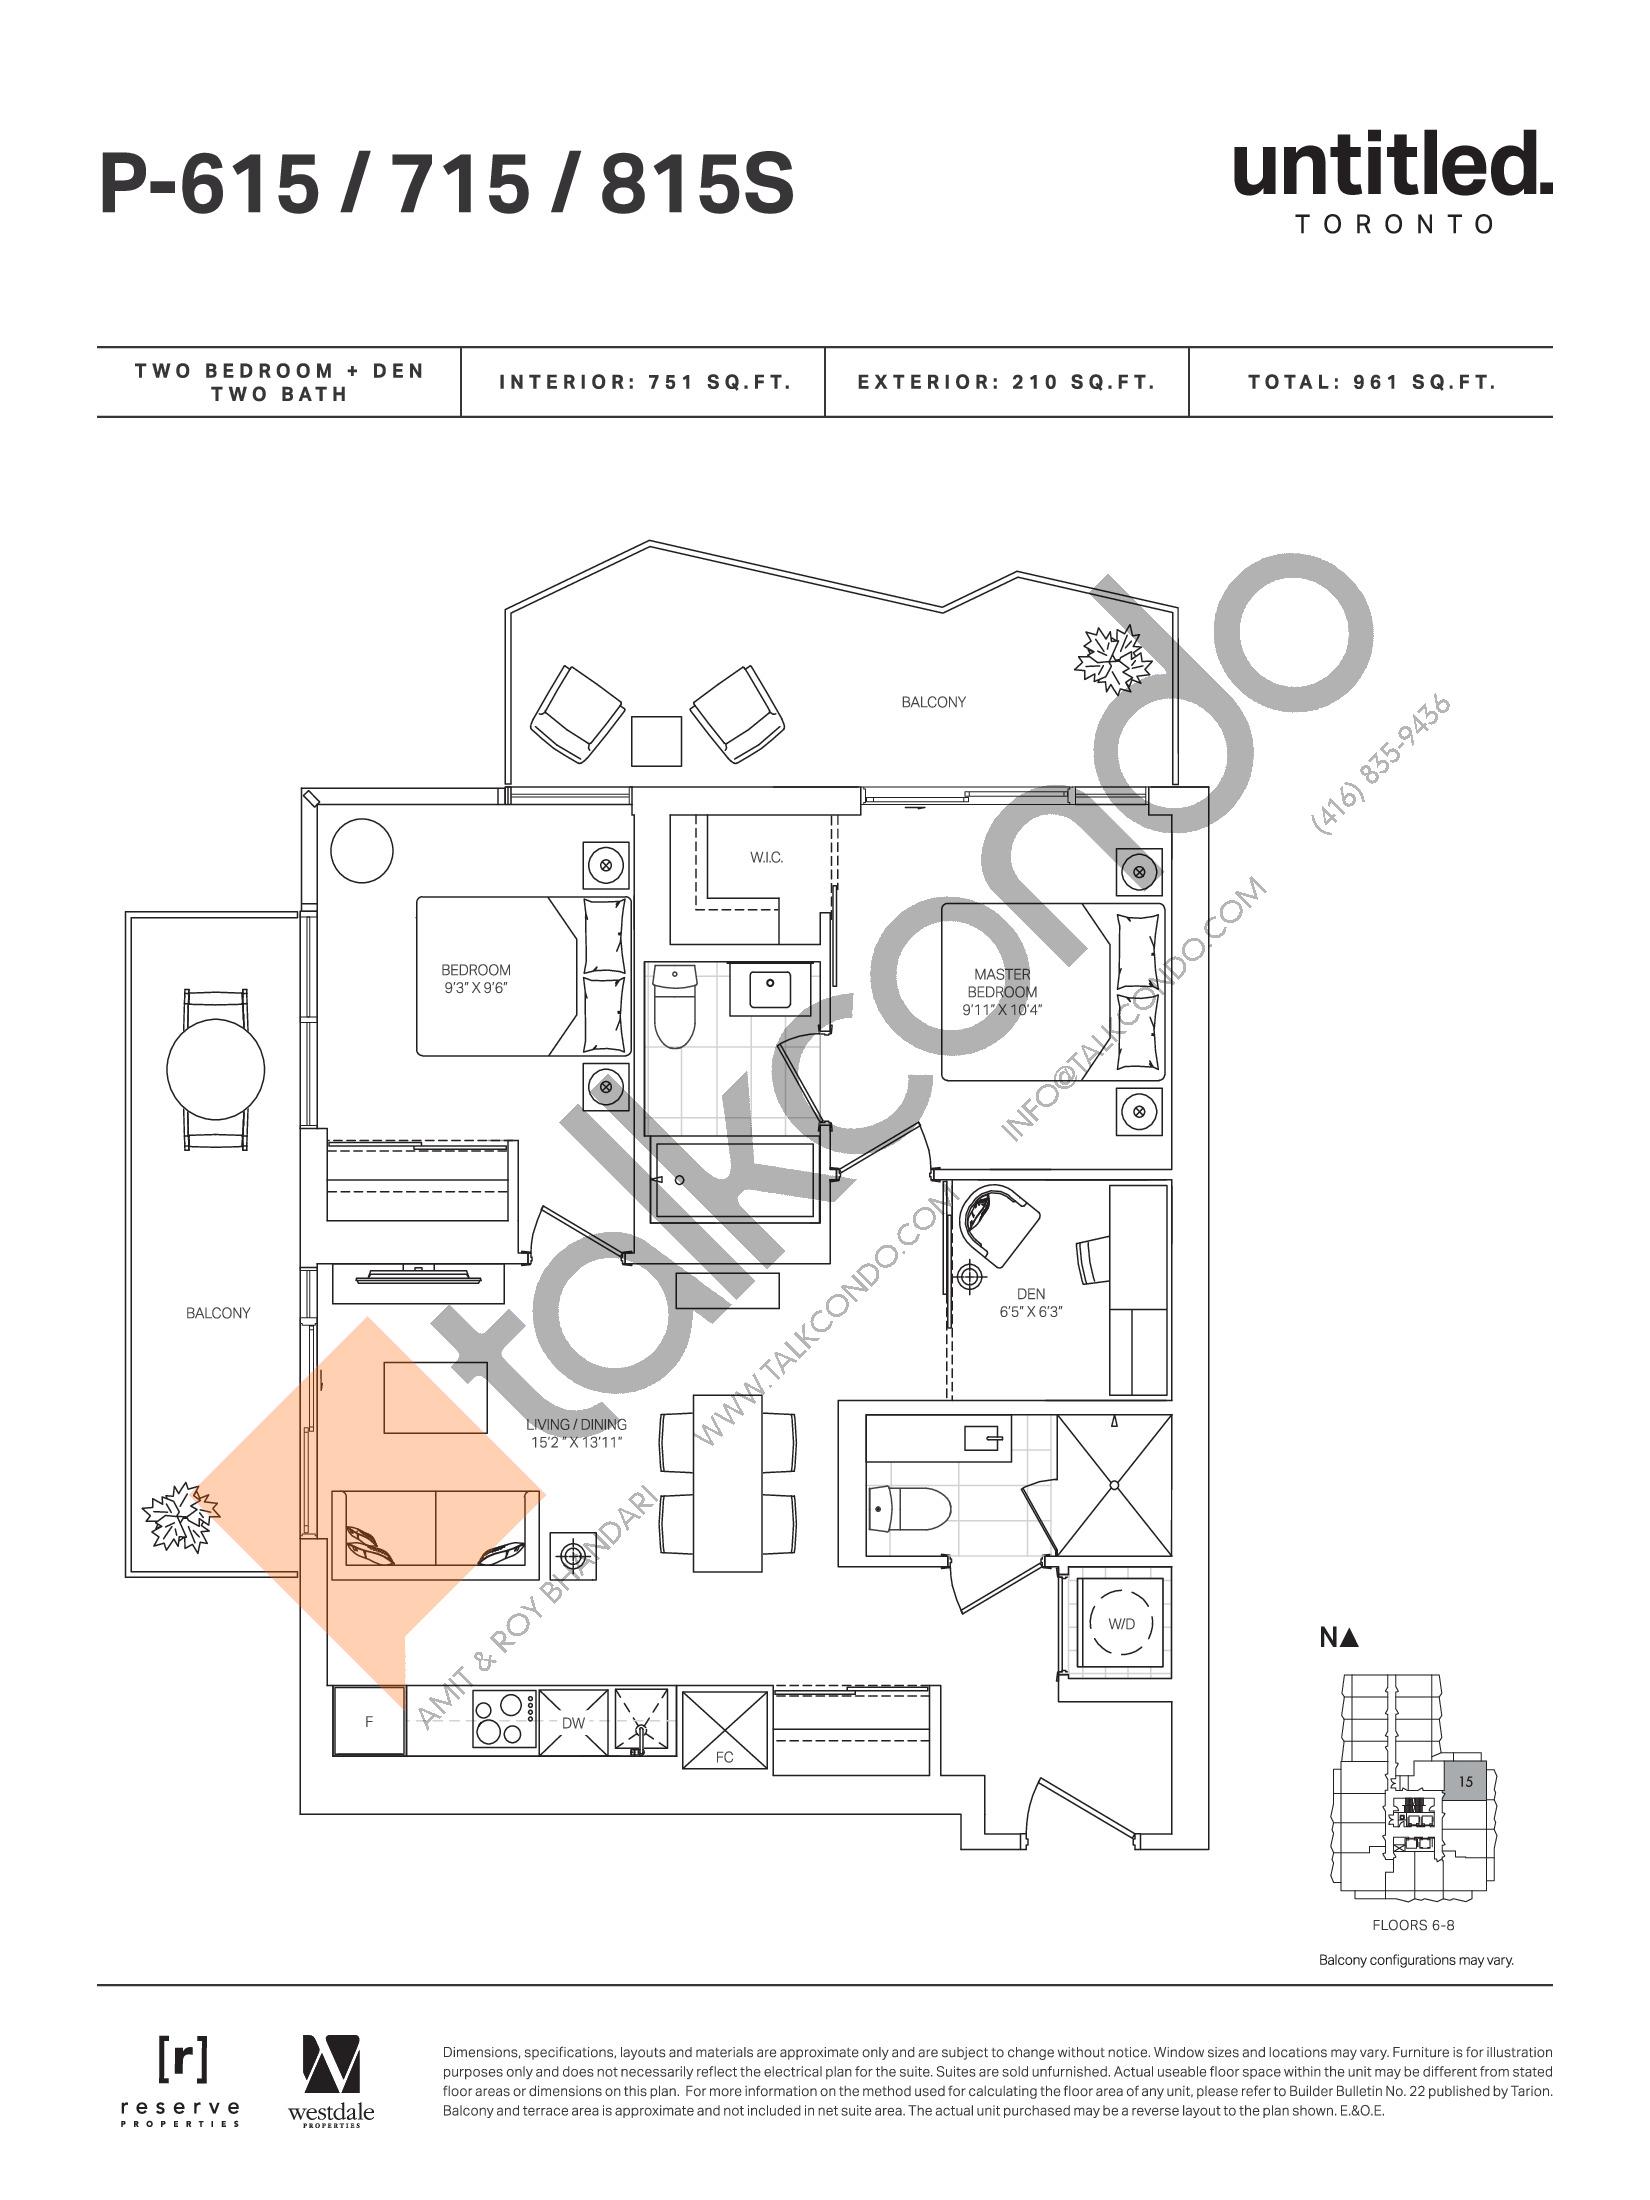 P-615 / 715 / 815S Floor Plan at Untitled Toronto Condos - 751 sq.ft